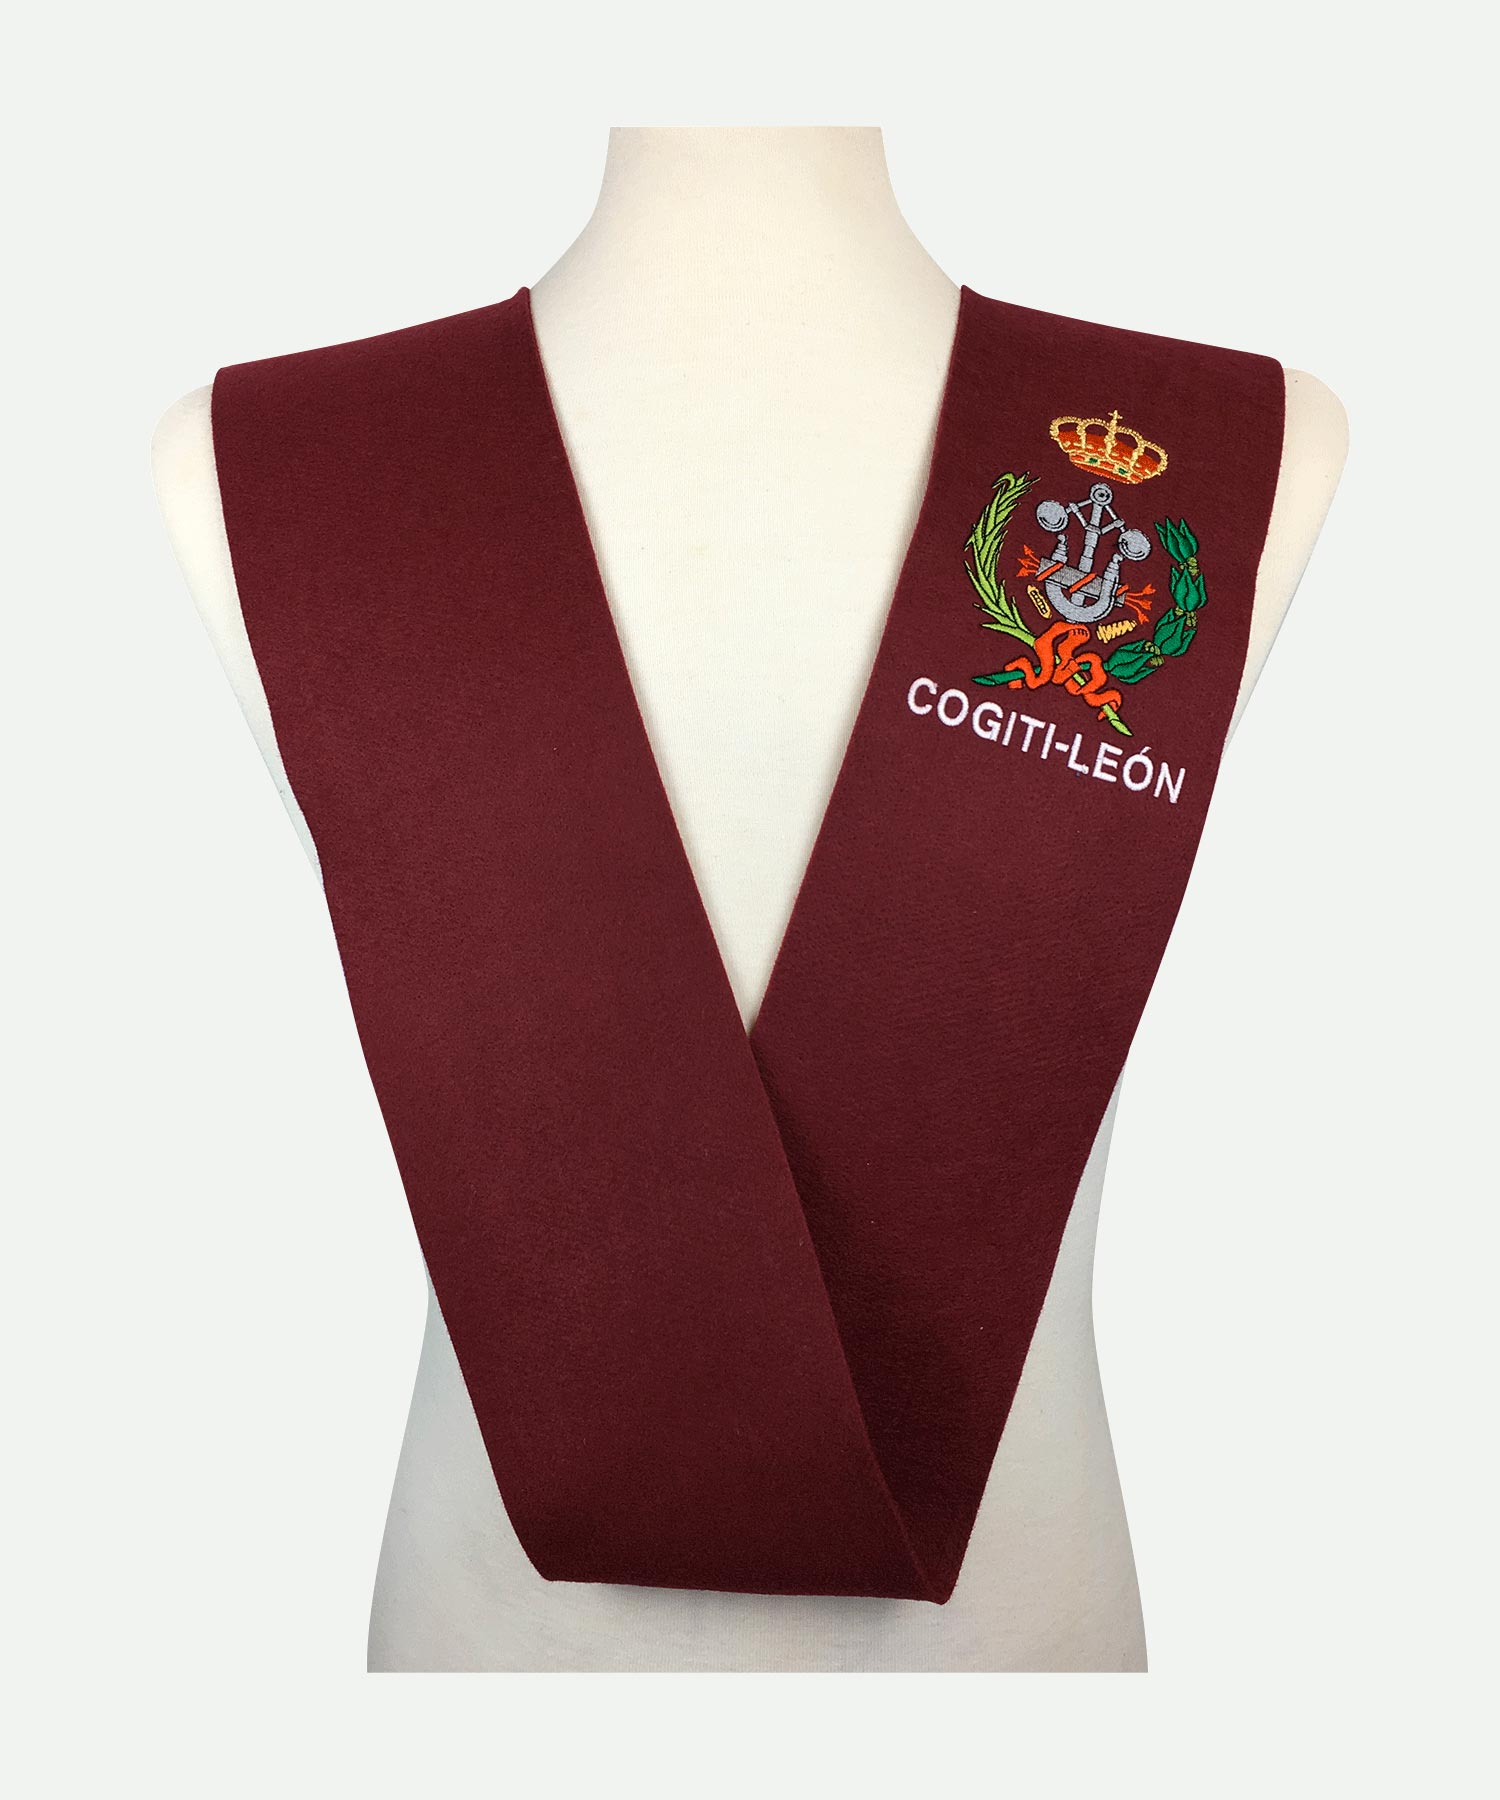 Beca COGITI León